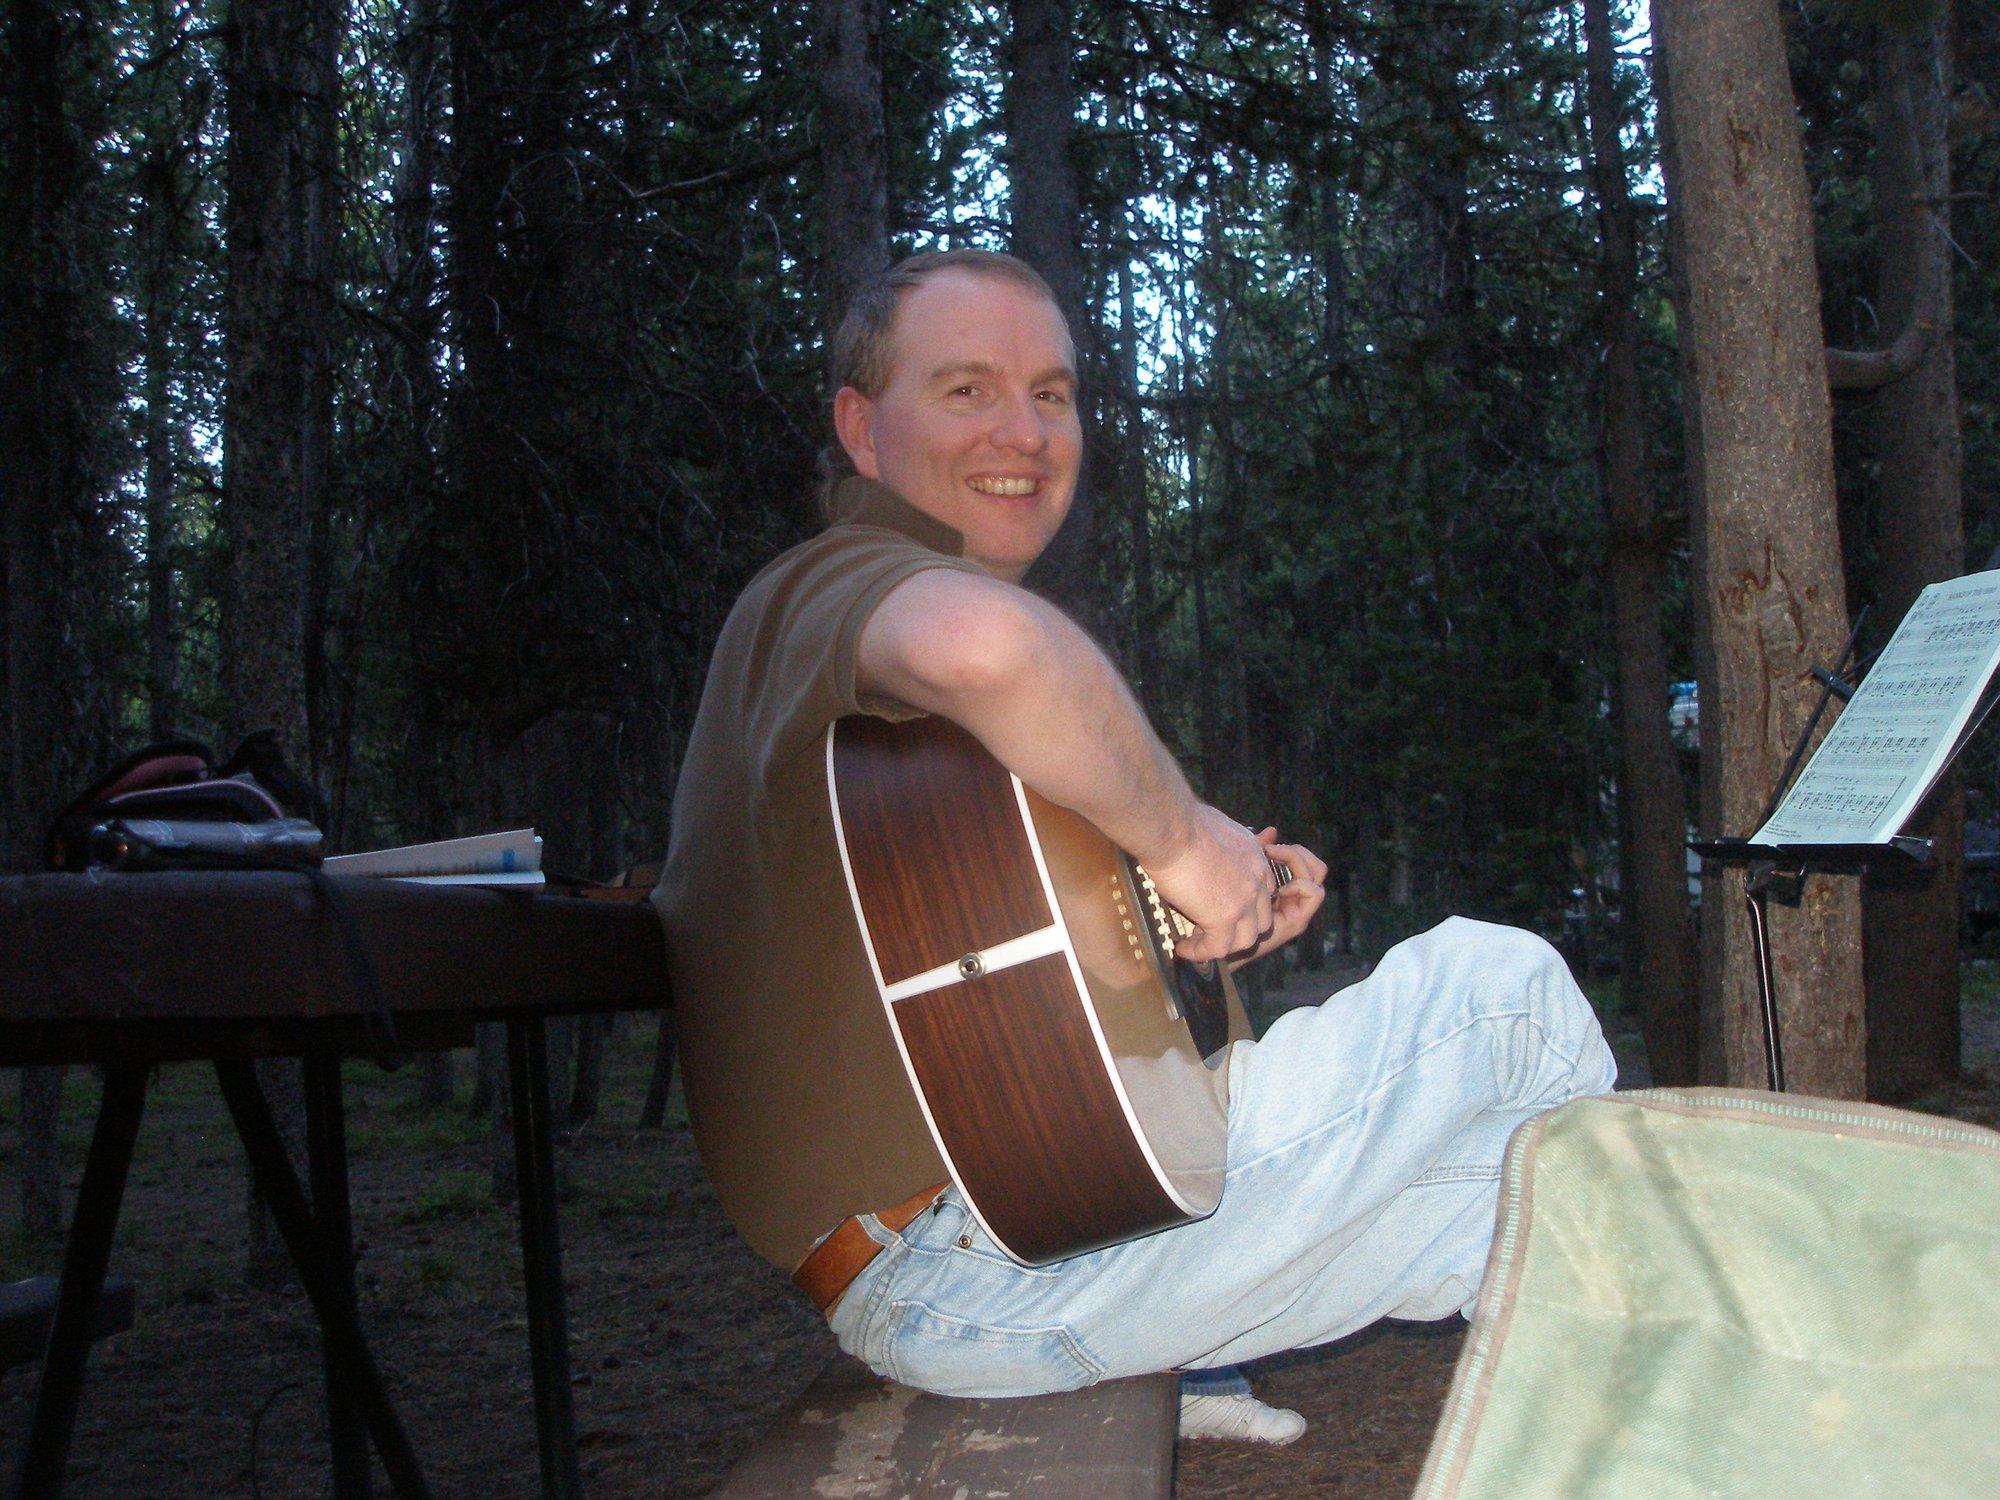 Yellowstone Michael on guitar.JPG